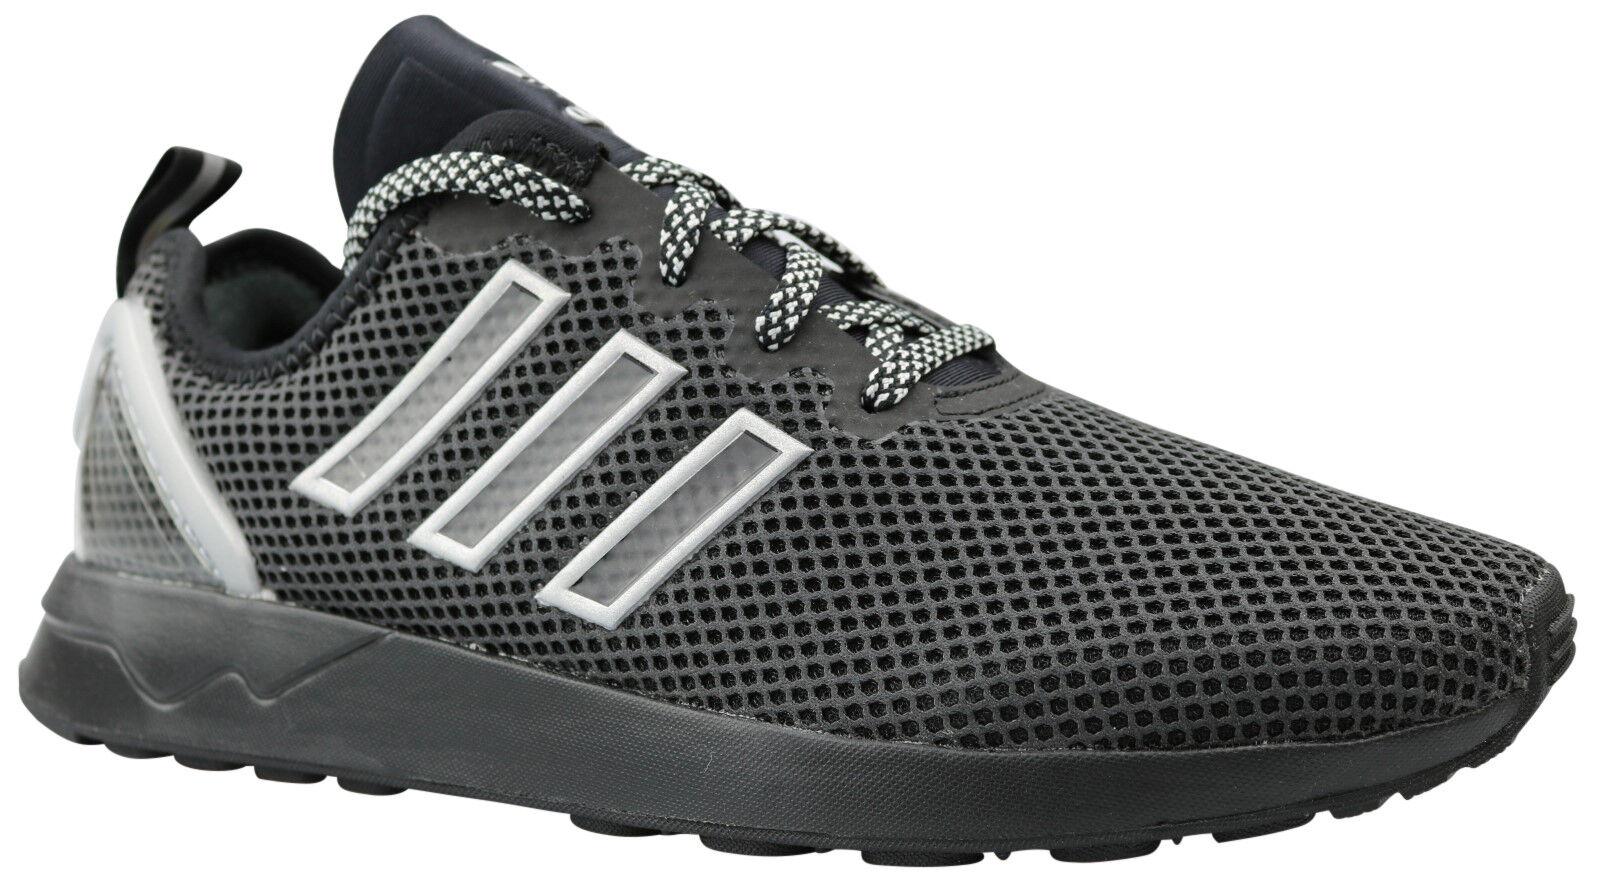 Adidas Originals ZX Flux ADV Racer 47 cortos zapatos s79004 & 47 Racer nuevo & OVP e93810